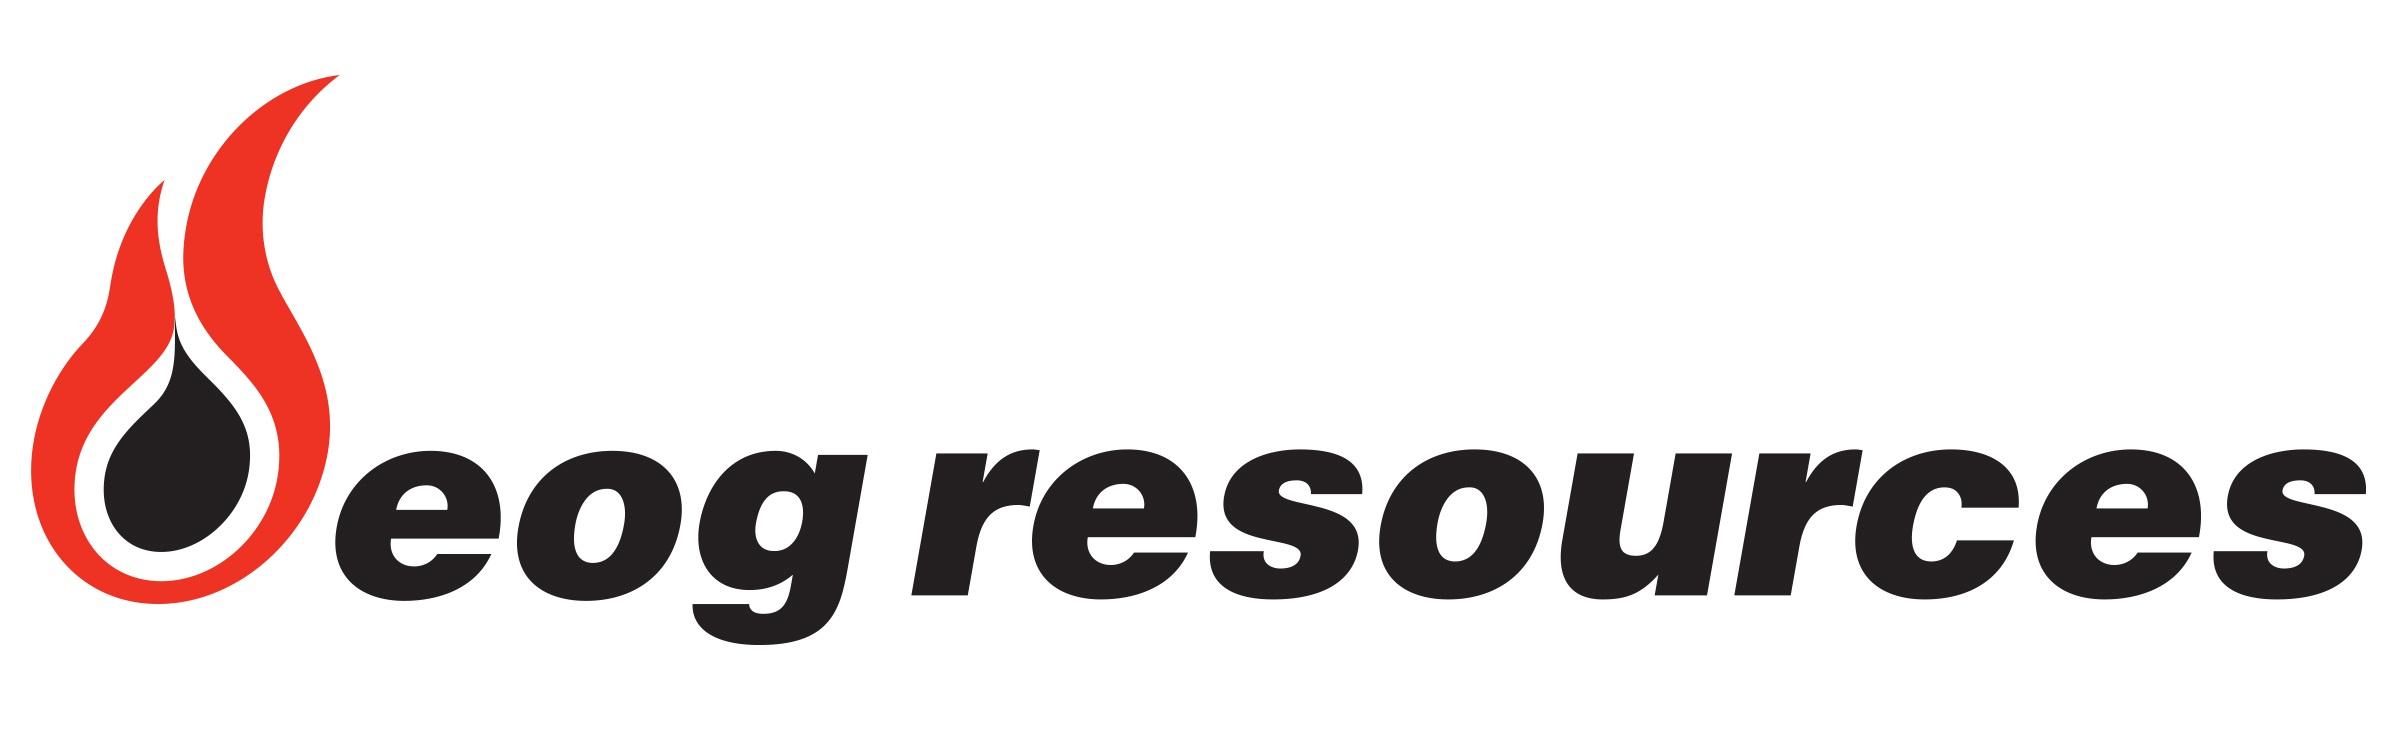 (JPEG) Standard Logo - Red and Black